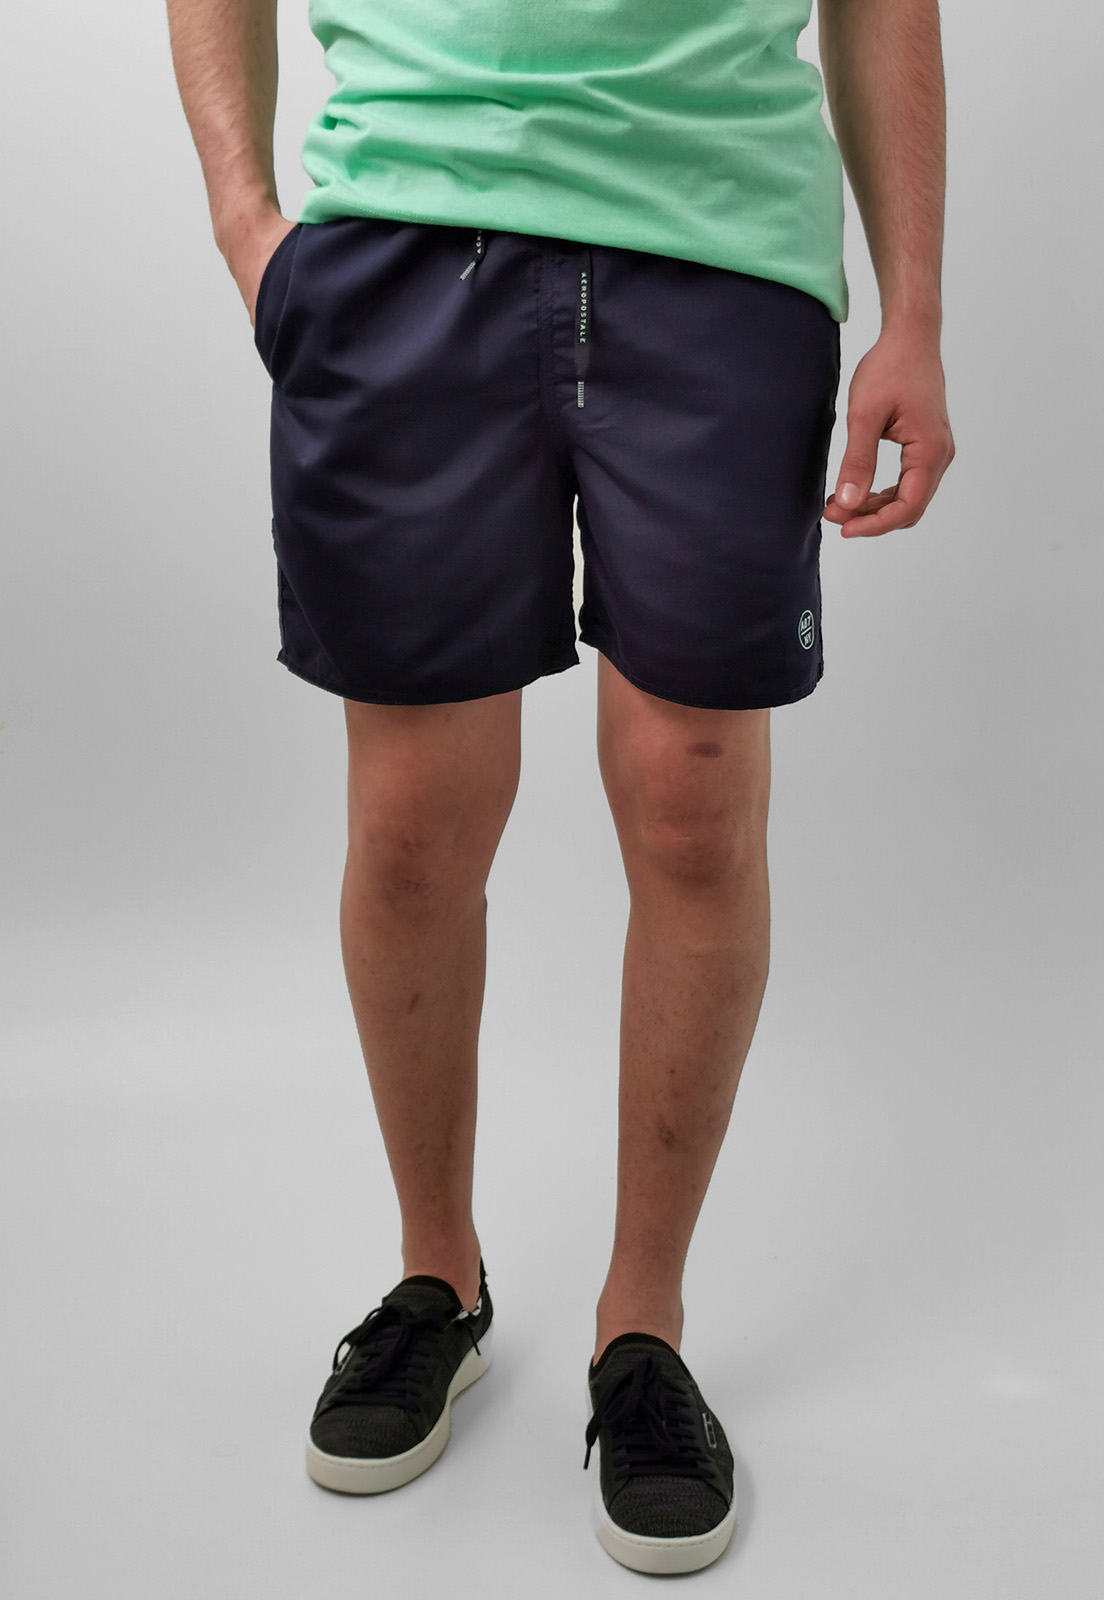 Bermuda Shorts Aéropostale Azul Marinho Básico